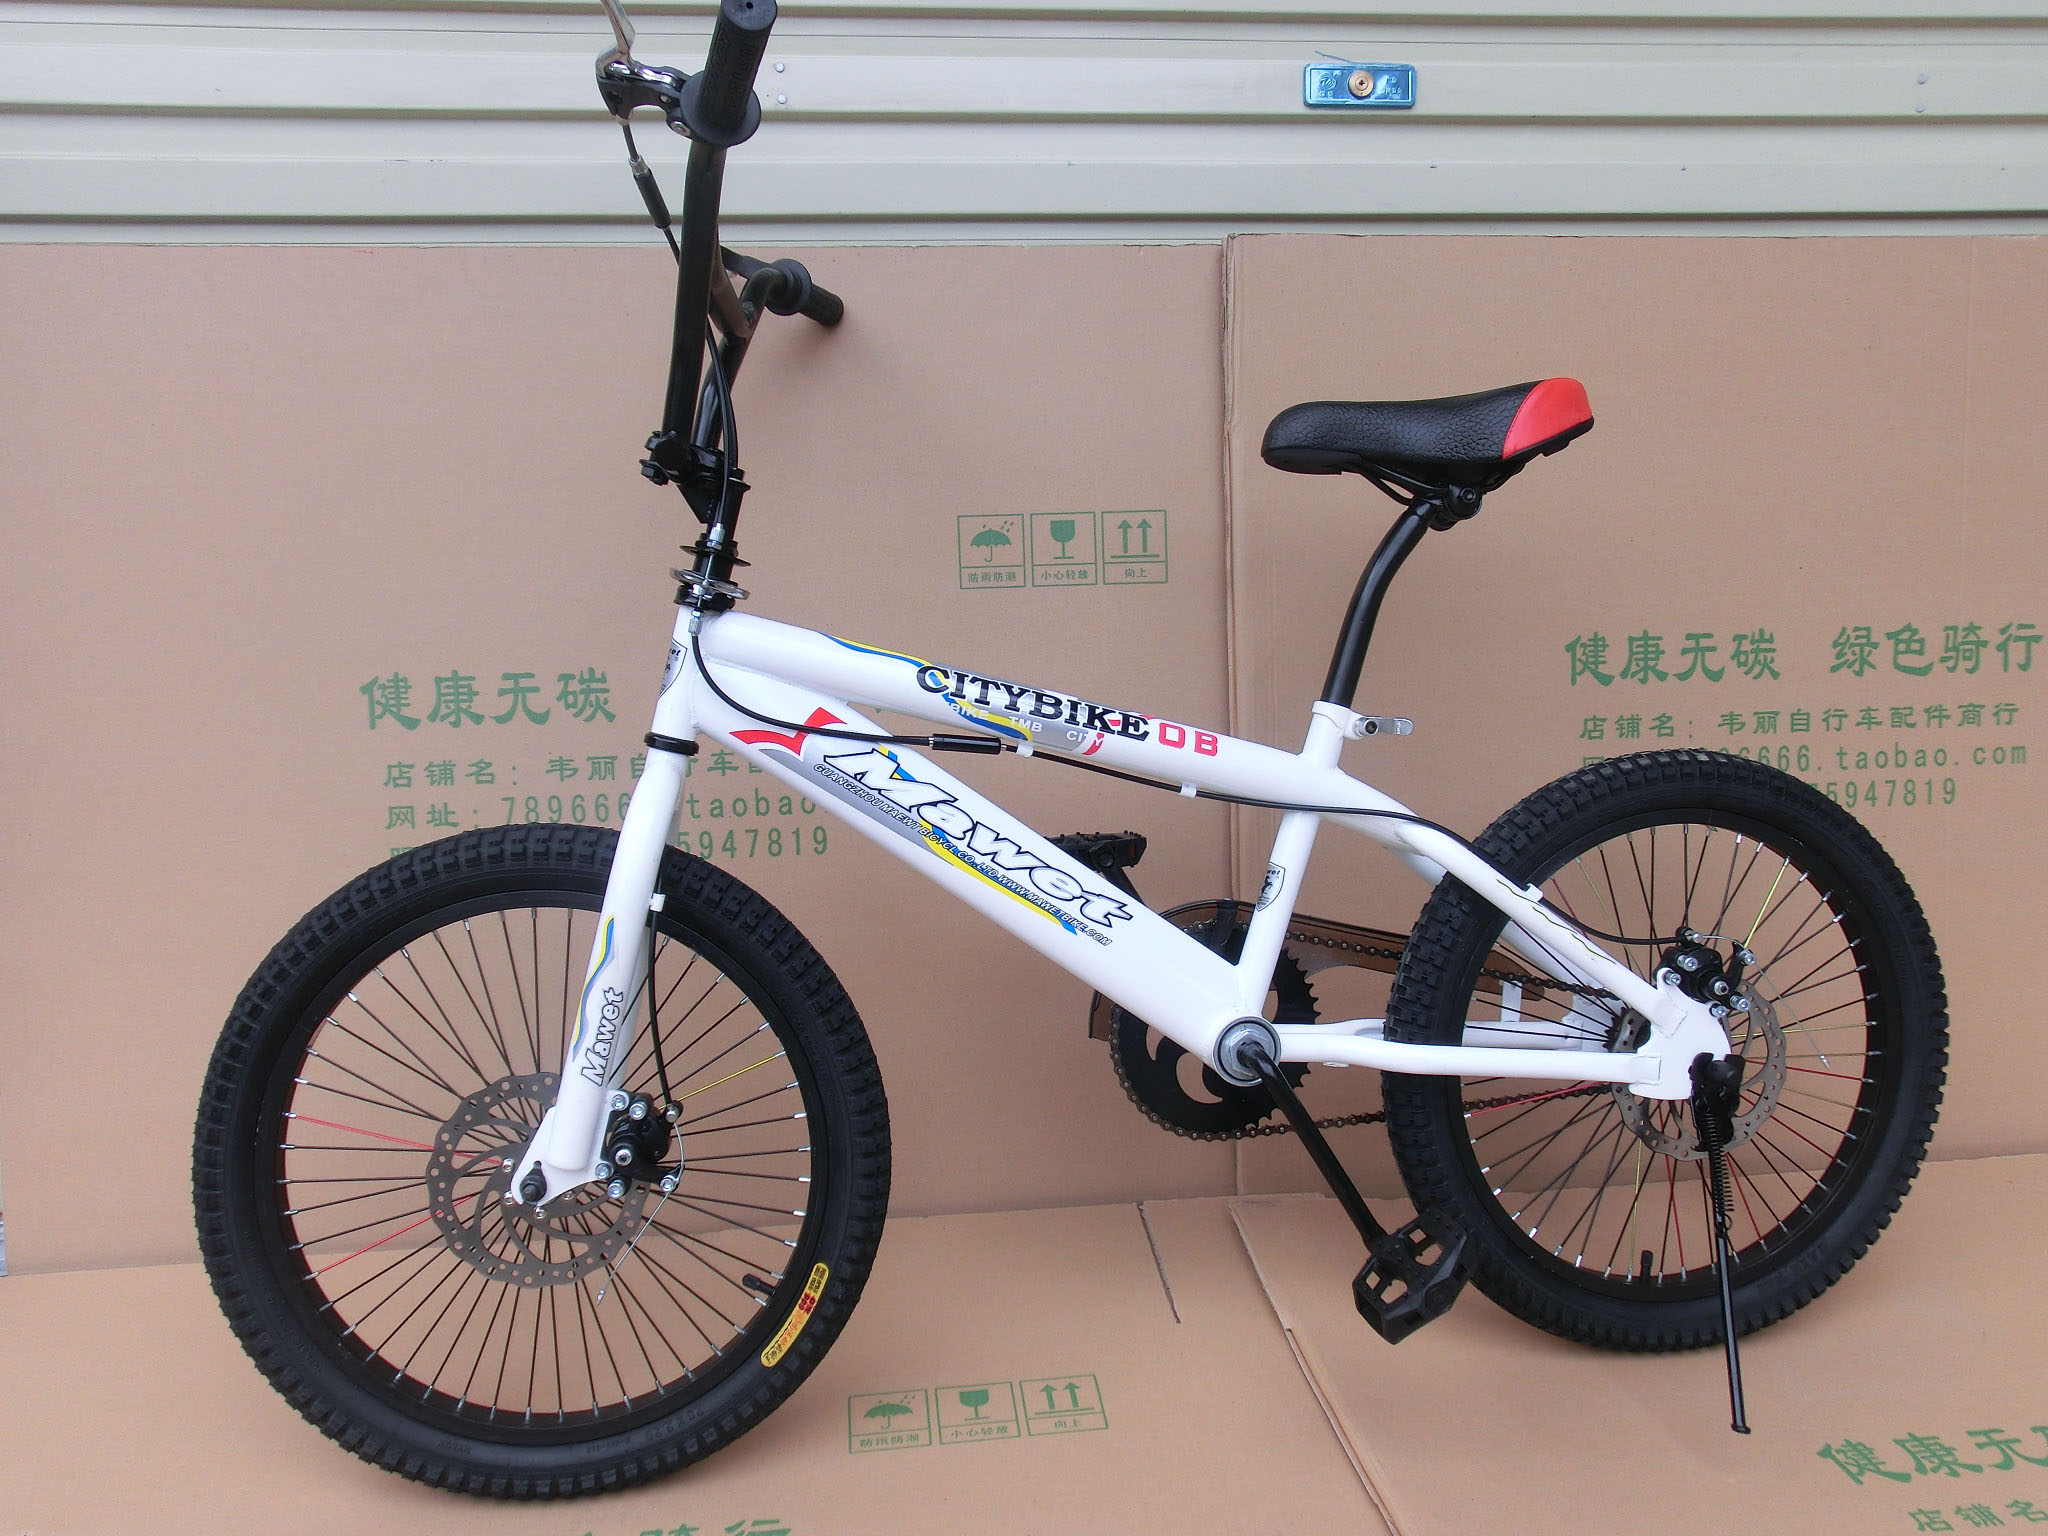 BMX小轮车BMX特技车花式街车马威特20寸碟刹表演车自行车